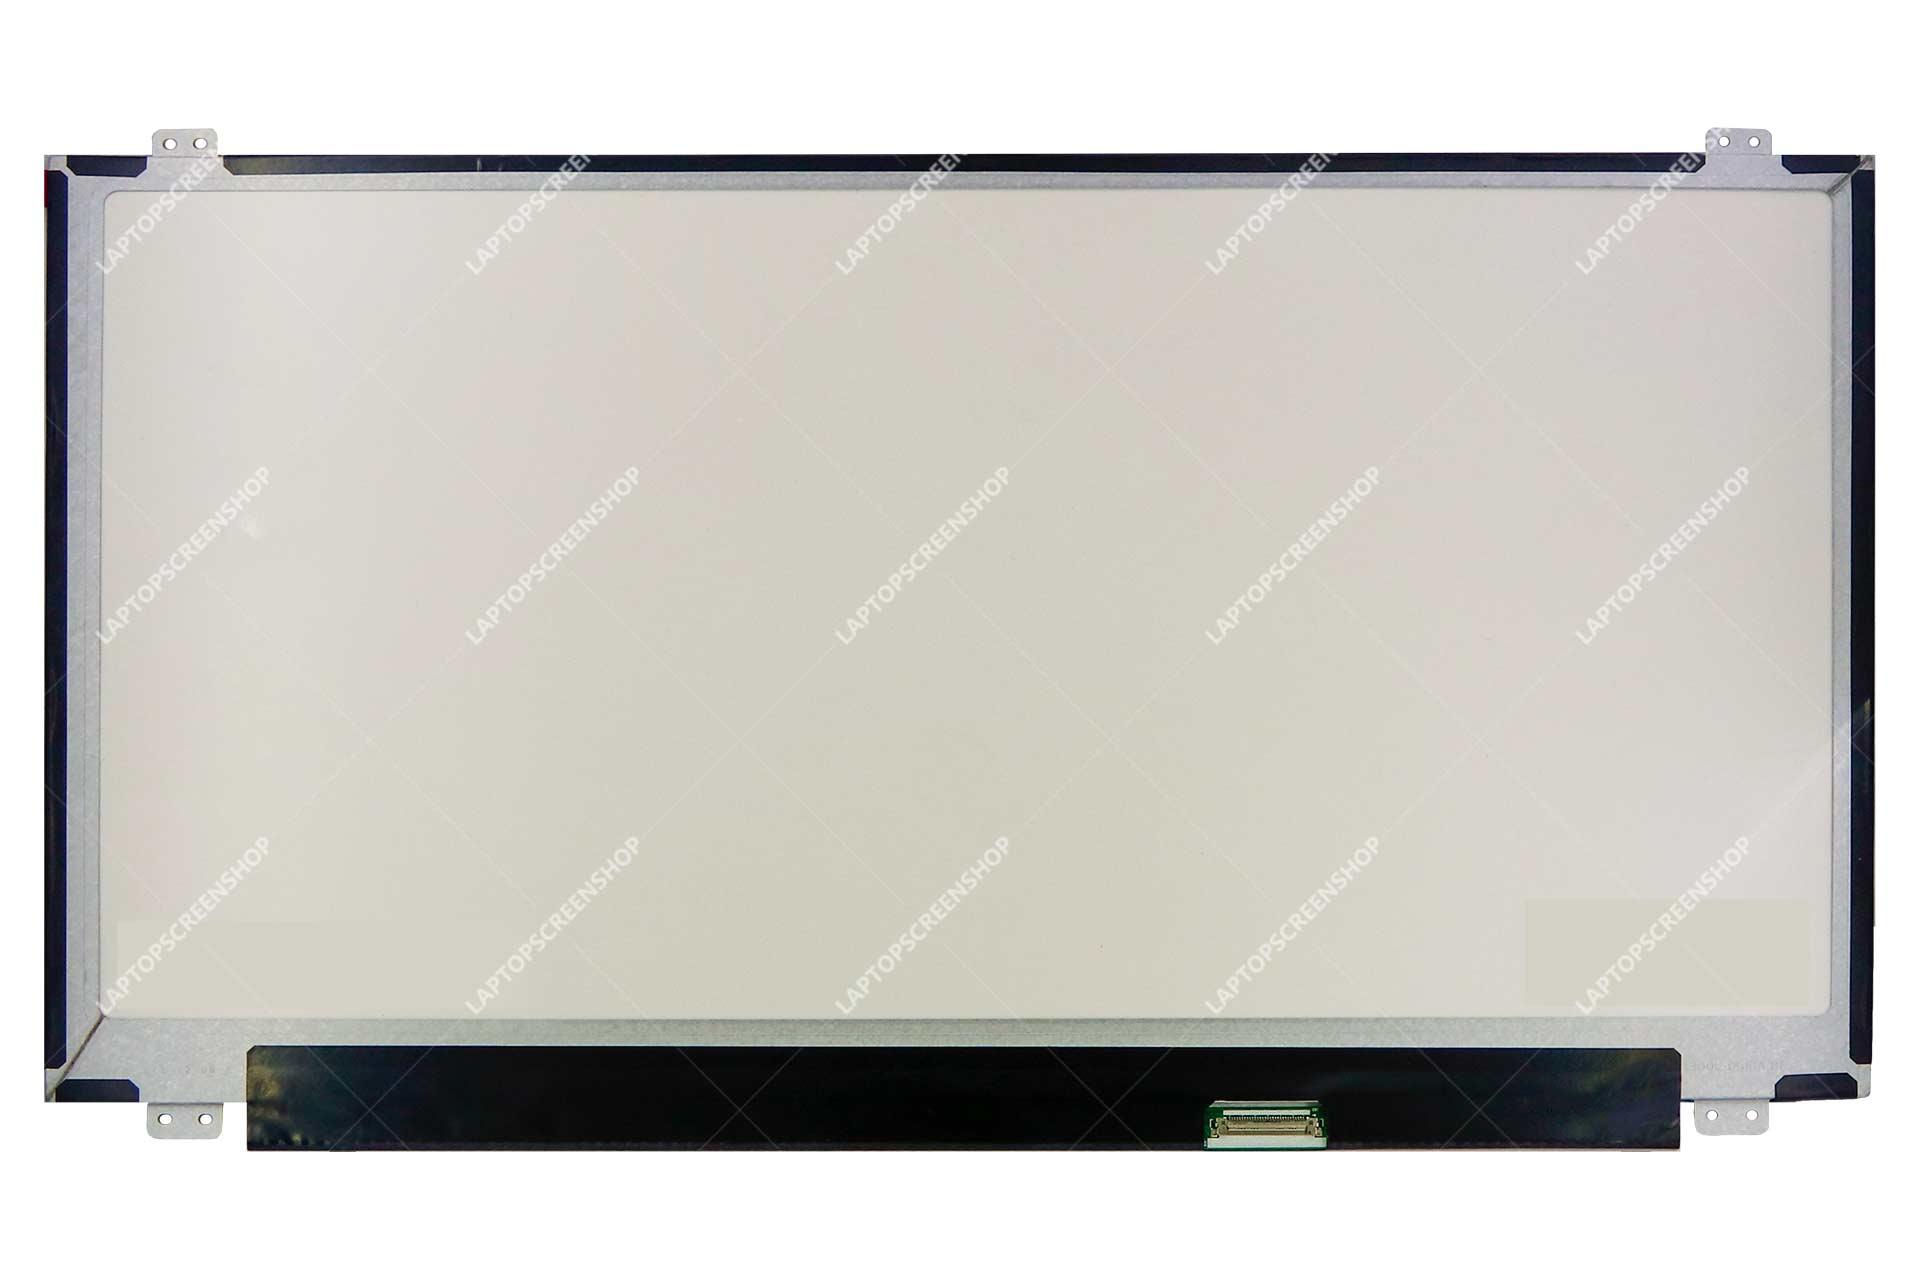 ACER-ASPIRE-E1-422-3444-LCD-LCD  HD فروشگاه لپ تاپ اسکرين   تعمير لپ تاپ